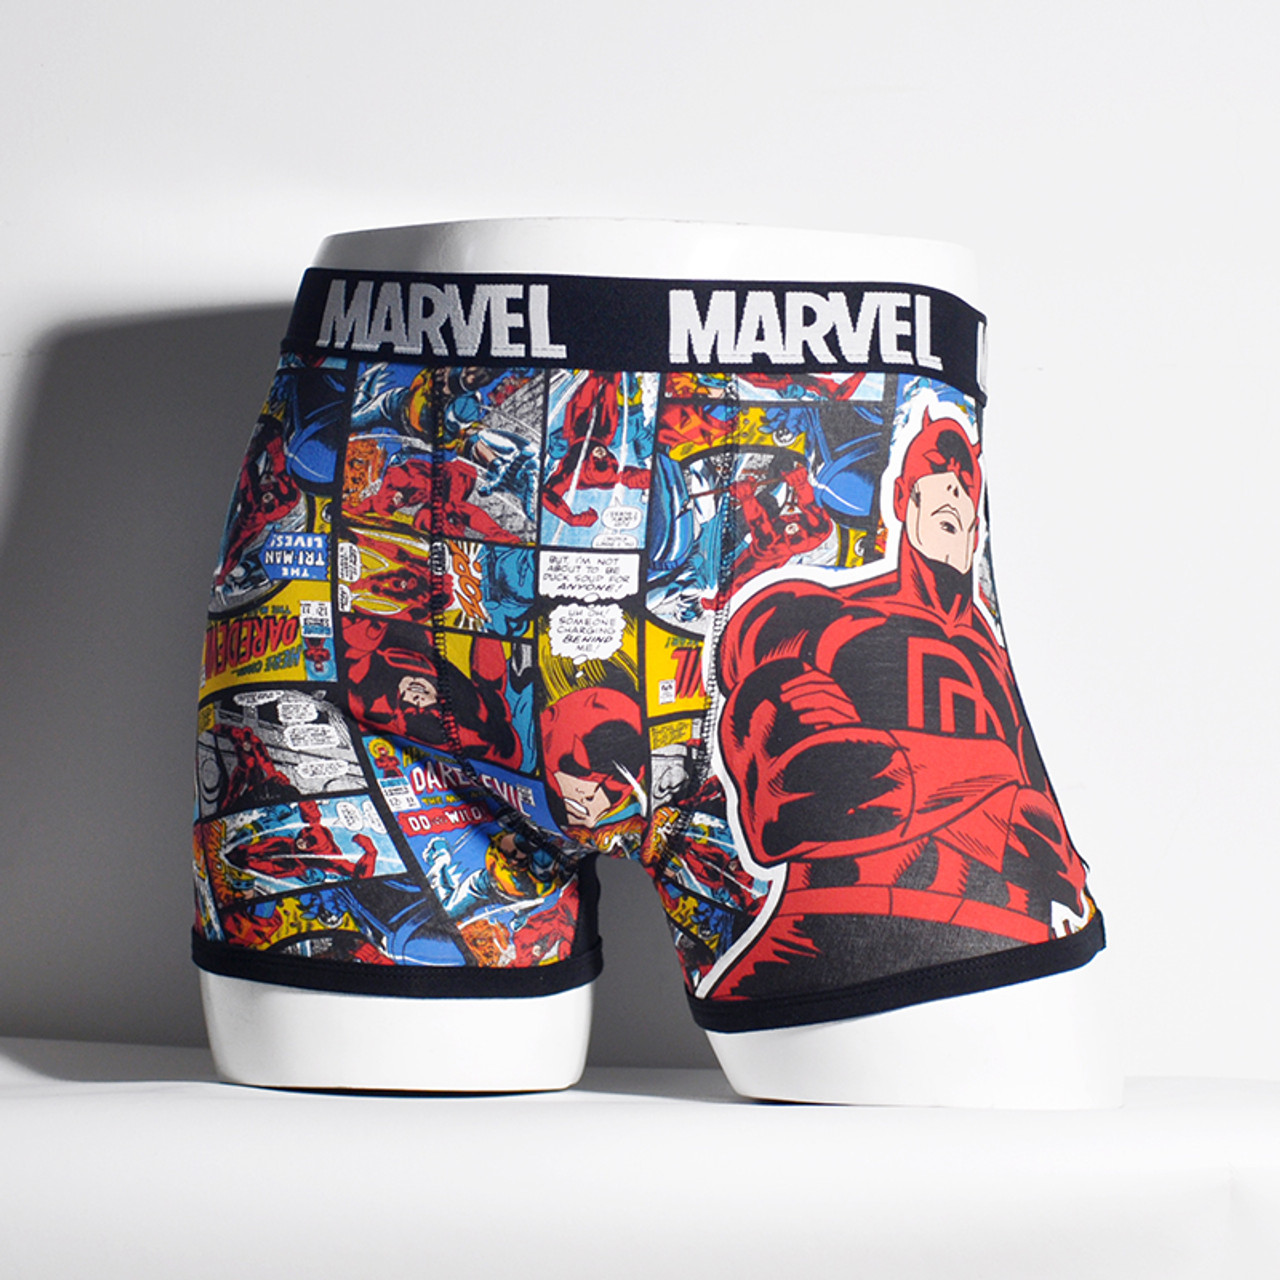 Men in panties cartoons Cartoon Men Underwear Brand Marvel Boxer Underpants Cotton Batman Comic Boxers Shorts Hombre Panties Mens Under Wear Trunks Onshopdeals Com